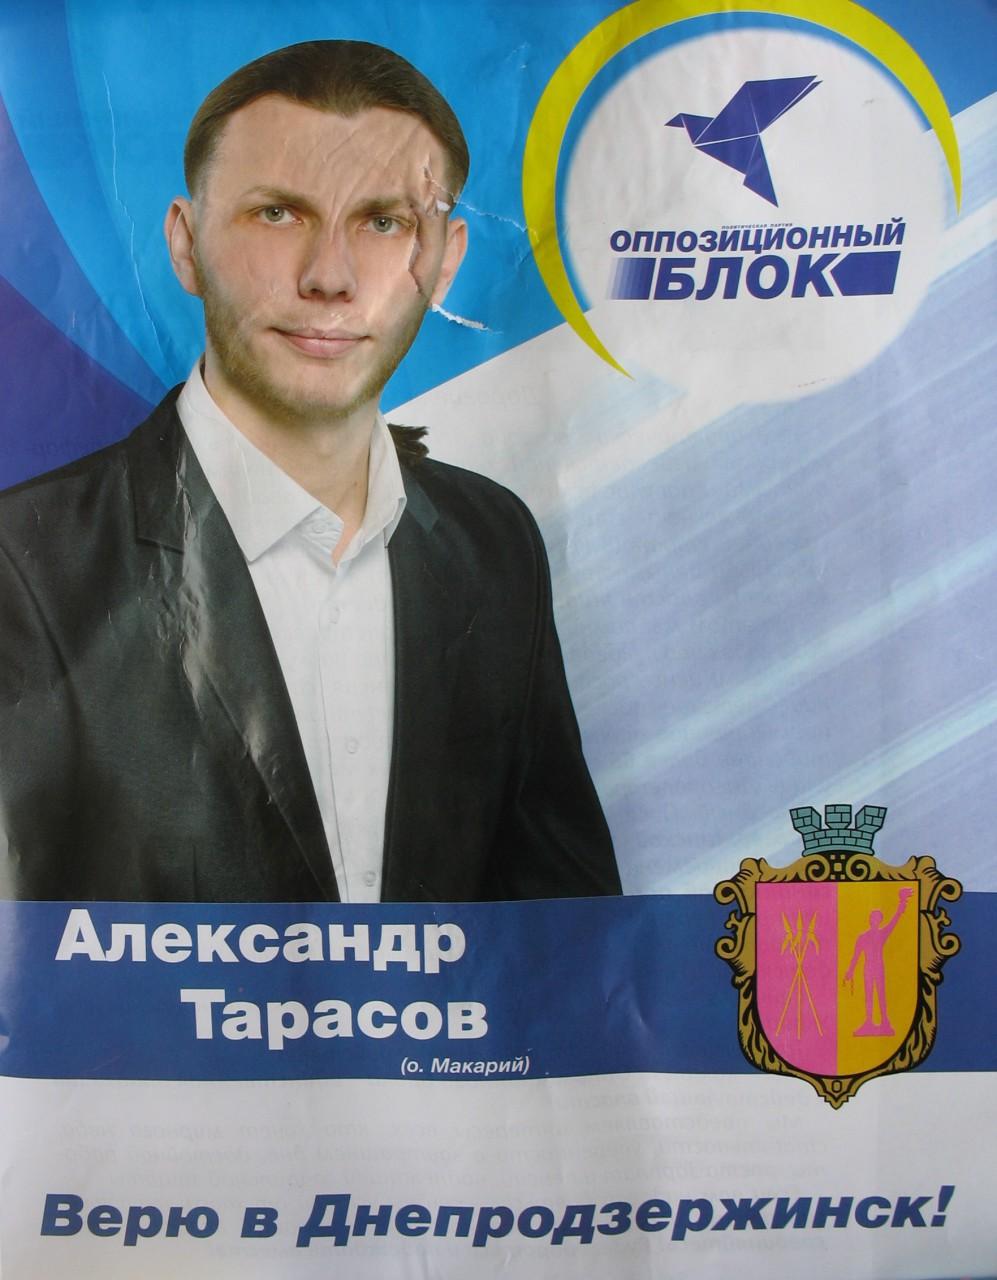 отец Макарий (Тарасов) и ОППОблок